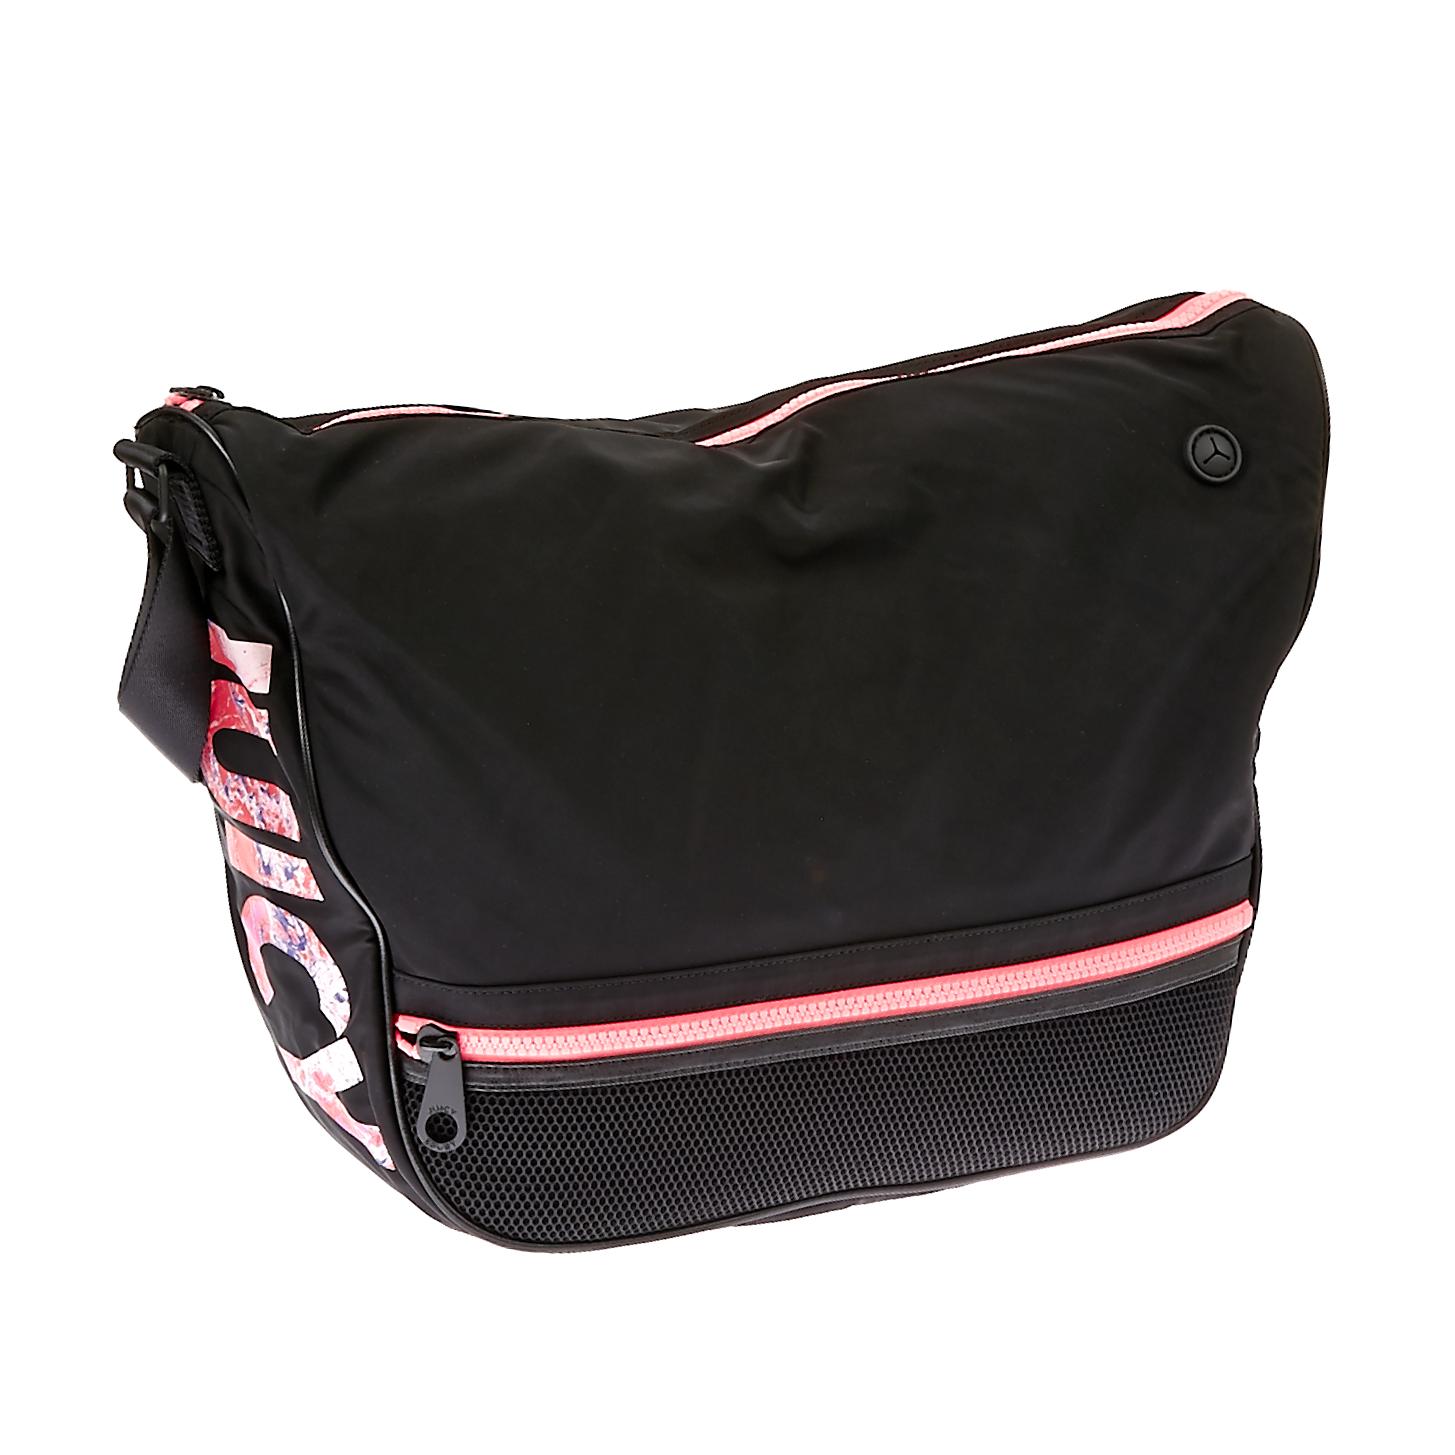 JUICY COUTURE – Γυναικεία τσάντα Juicy Couture μαύρη 1409508.0-0071